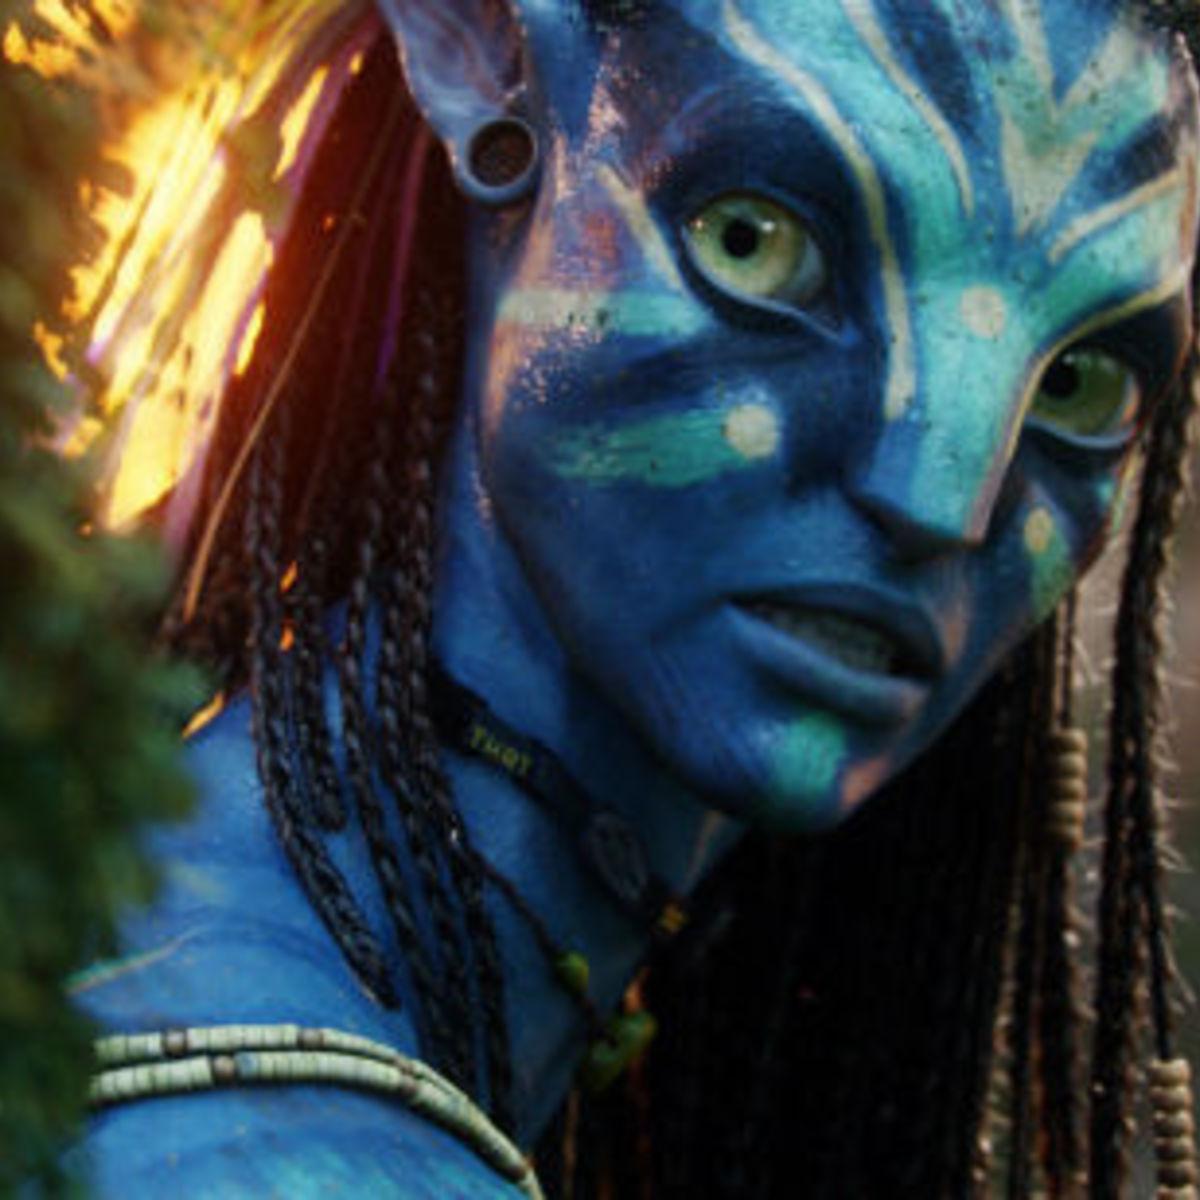 Avatar_neytiri_saldana_facepaint_5.jpg